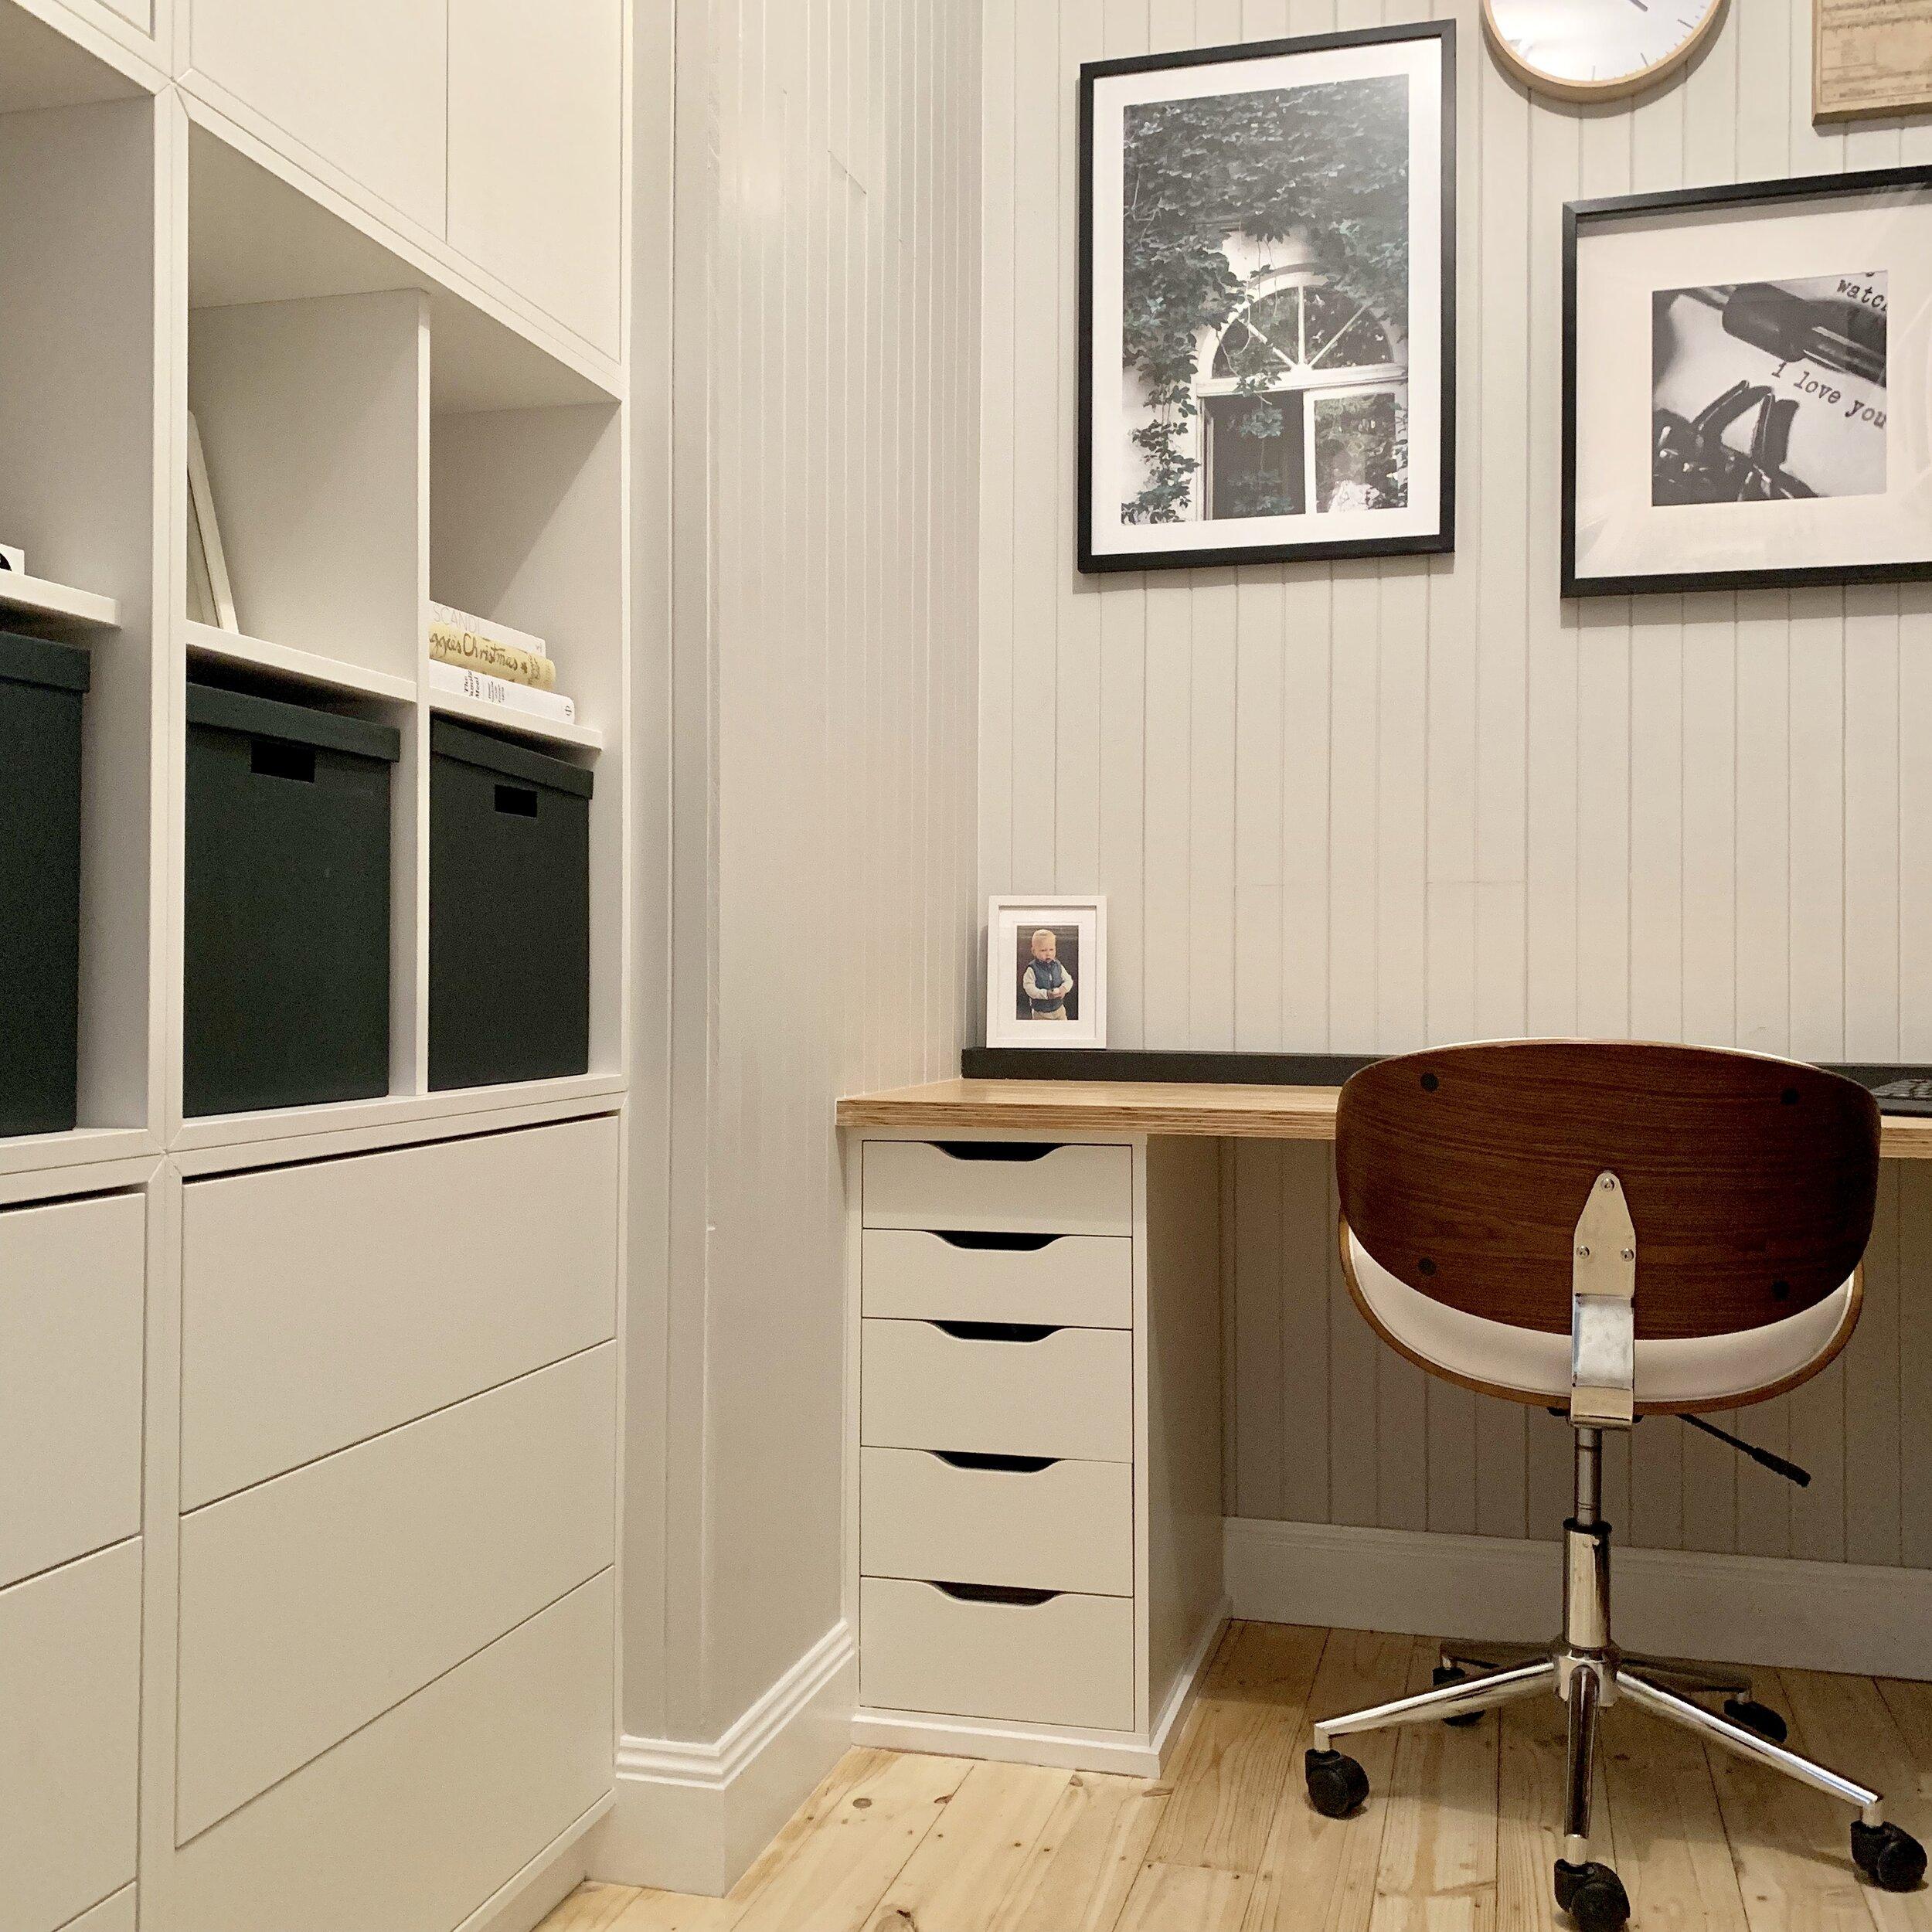 Design 2 Build - Warrnambool Interior Designer - Warrnambool Home Design 2.jpg